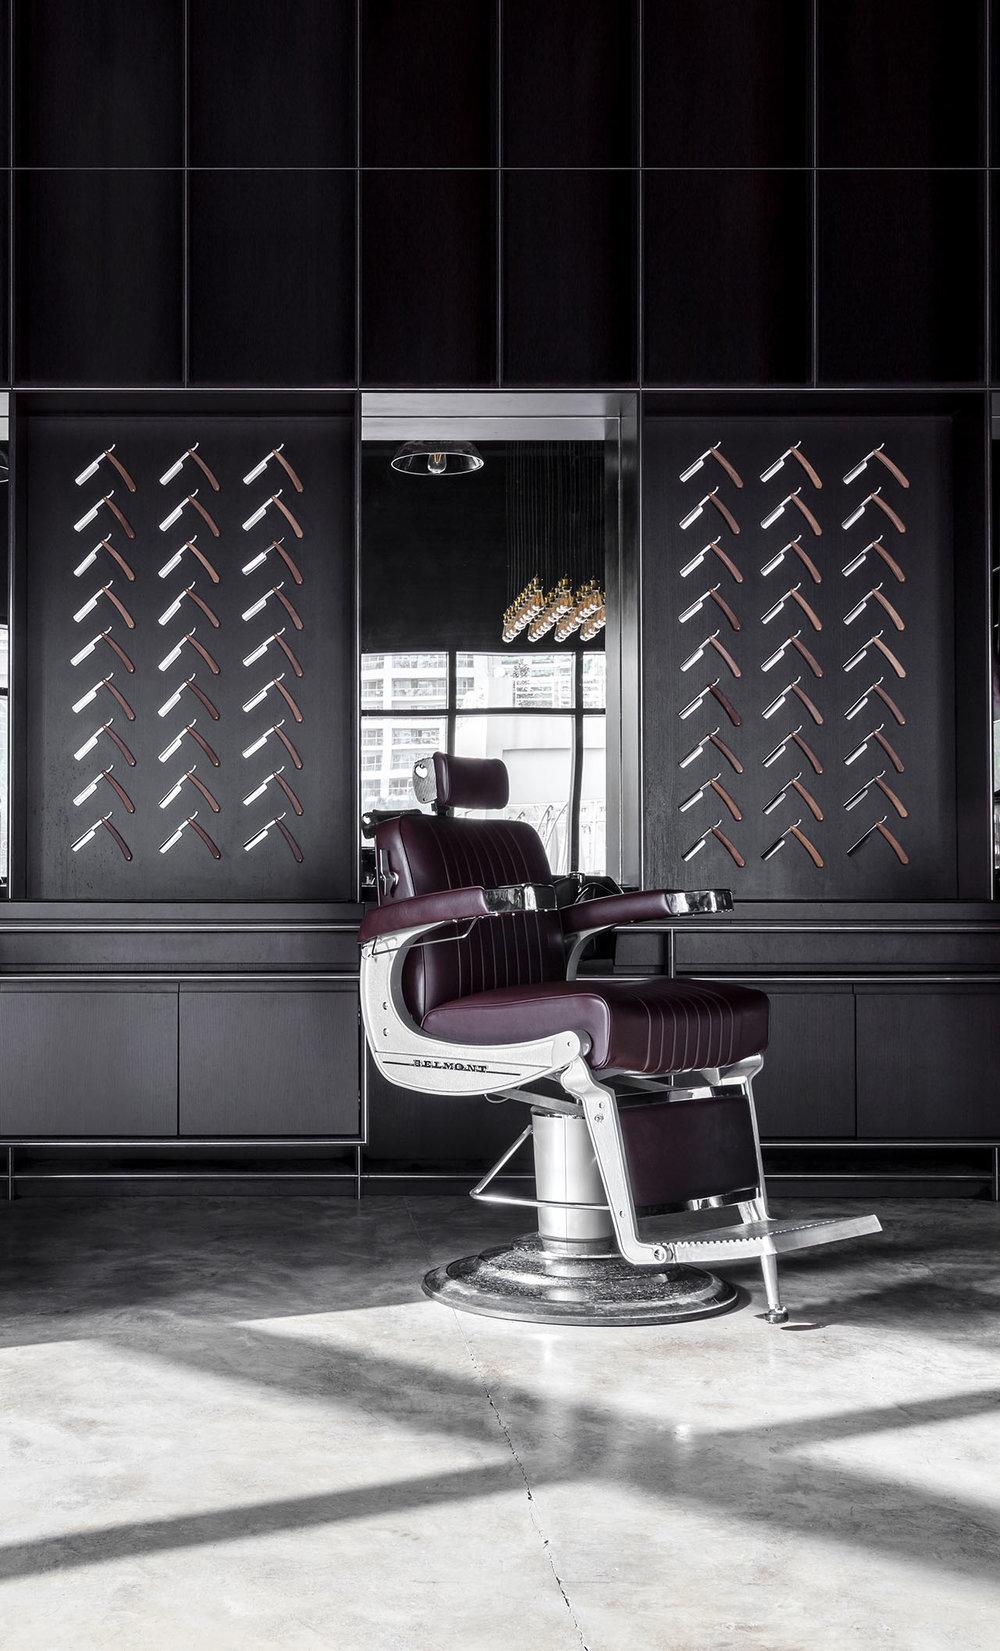 Chaps & Co-JLT-Dubai-Barbershop-Belmont-Chair-Brown-Leather-Blades-Joinery-Interior-Architect.jpg